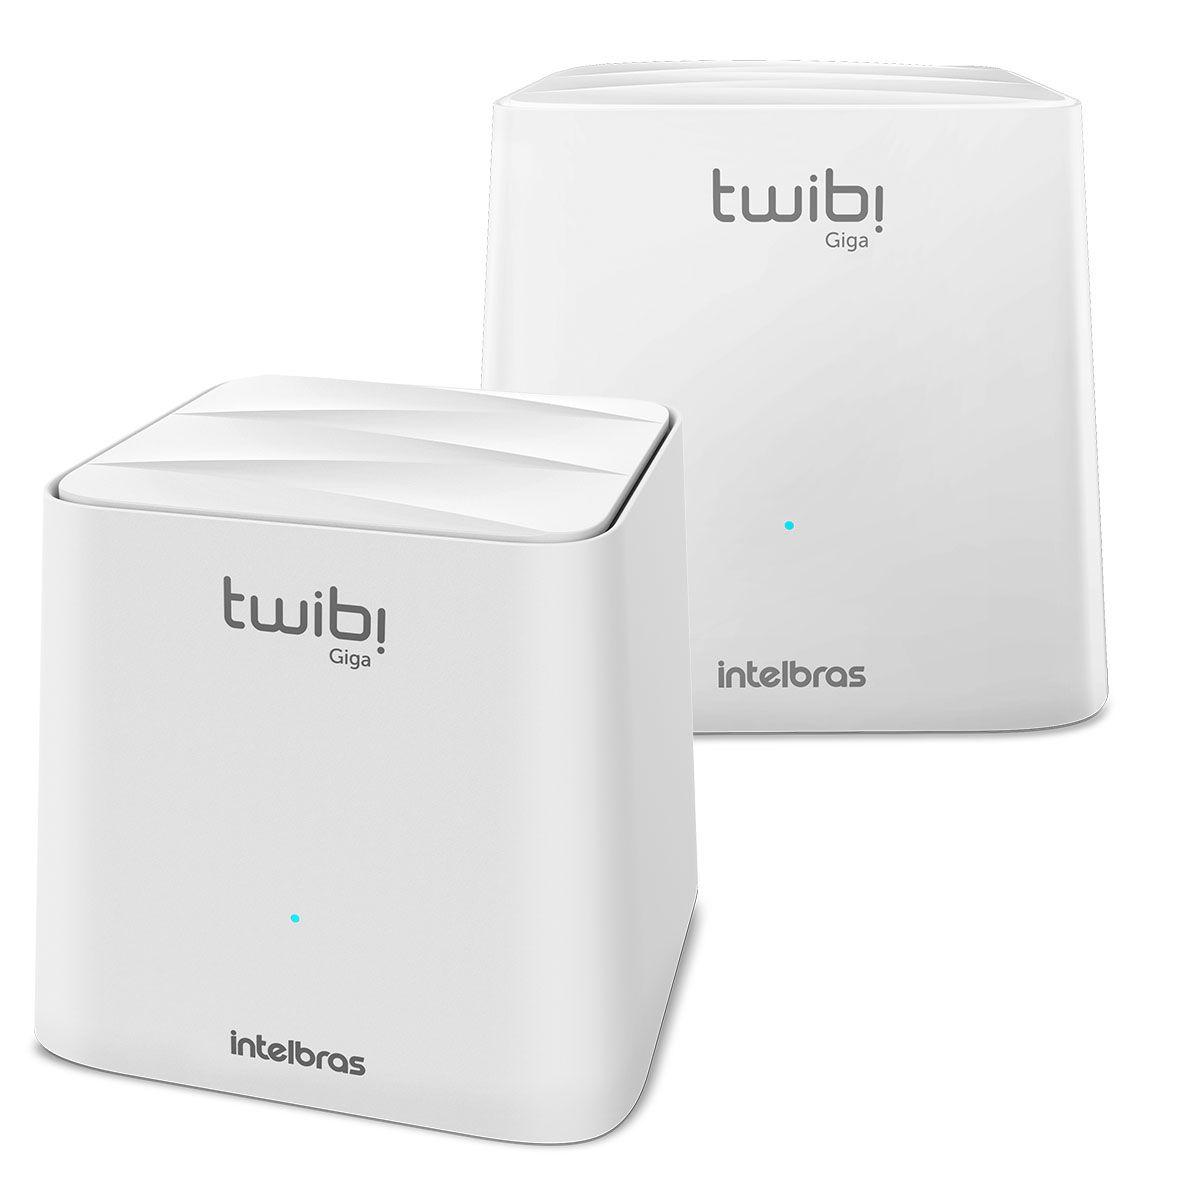 Roteador Wi Fi Intelbras Twibi Giga Mesh 2 Módulos